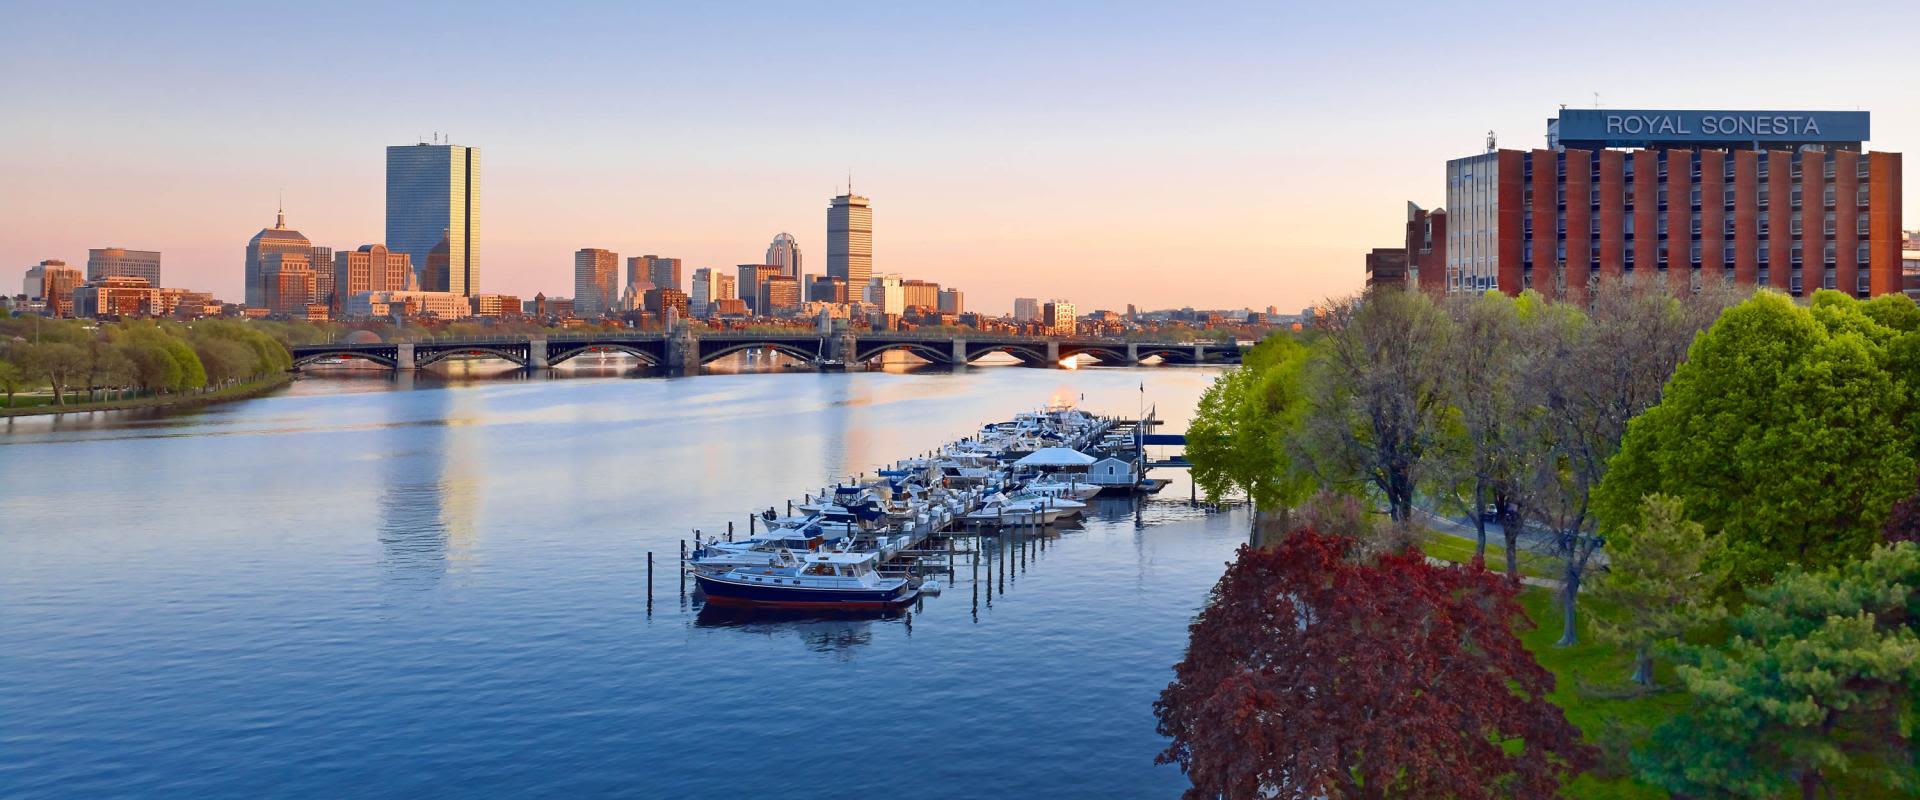 Royal Sonesta Boston Cambridge